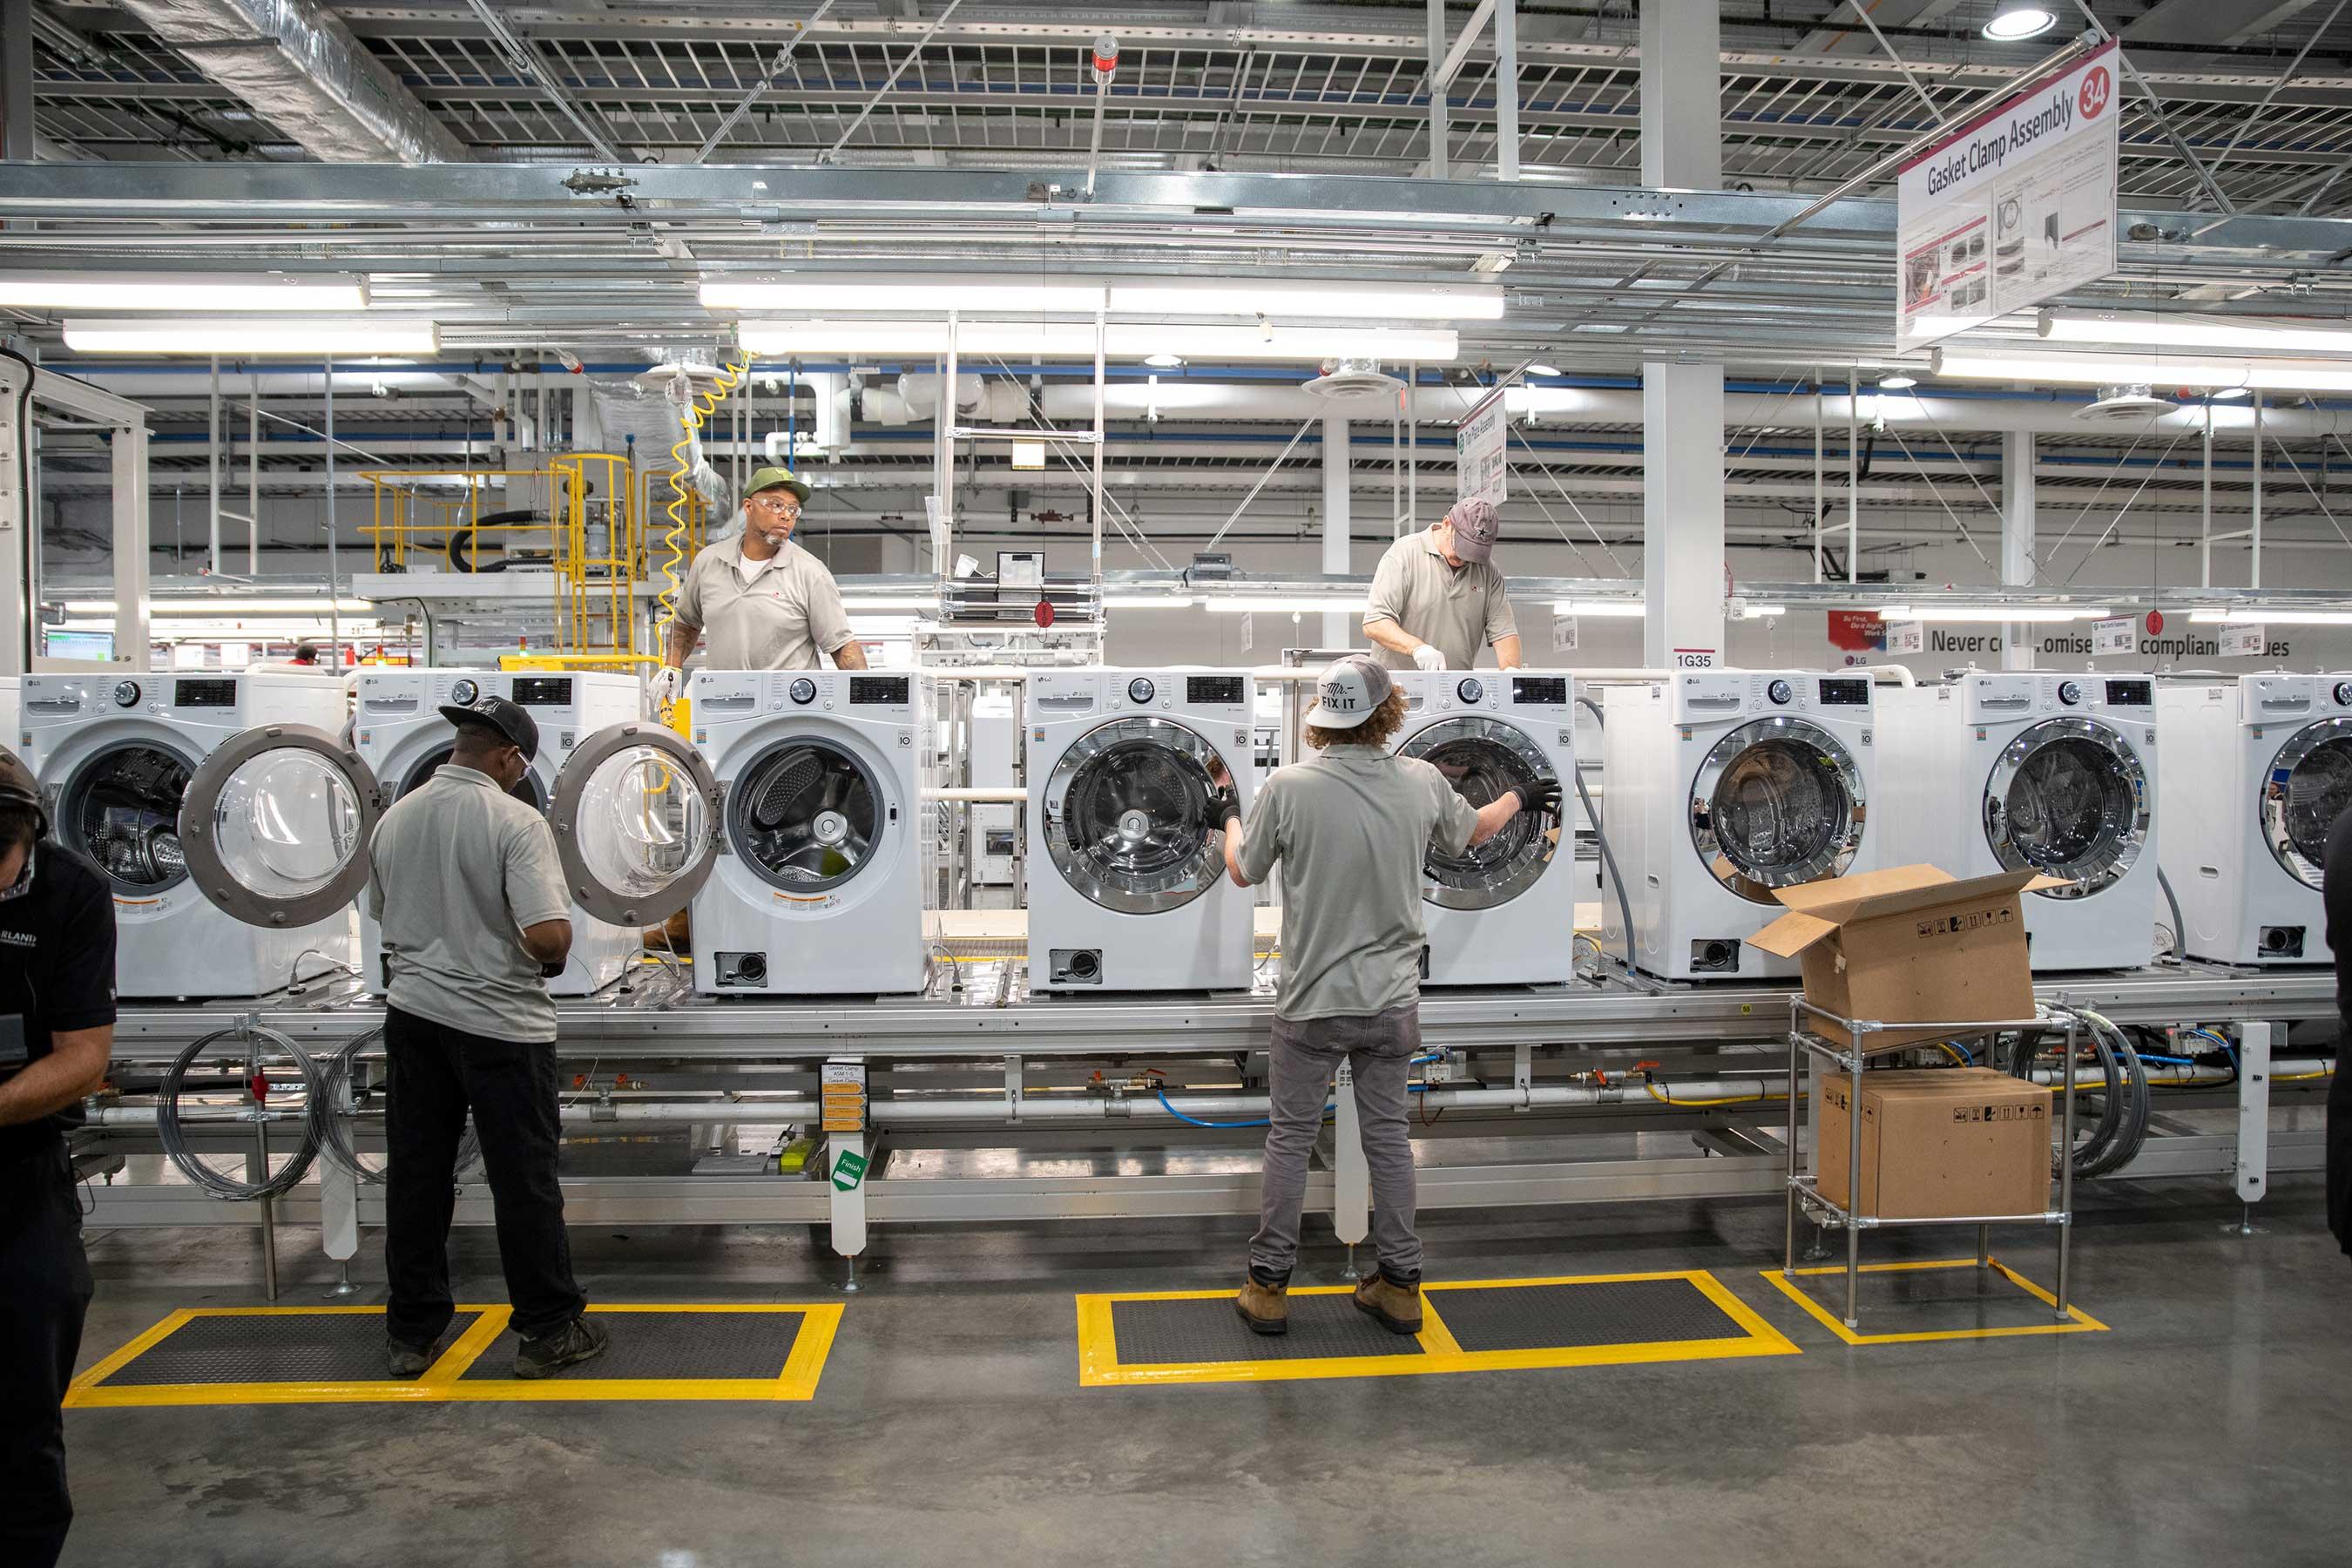 Produce fabrication appliances